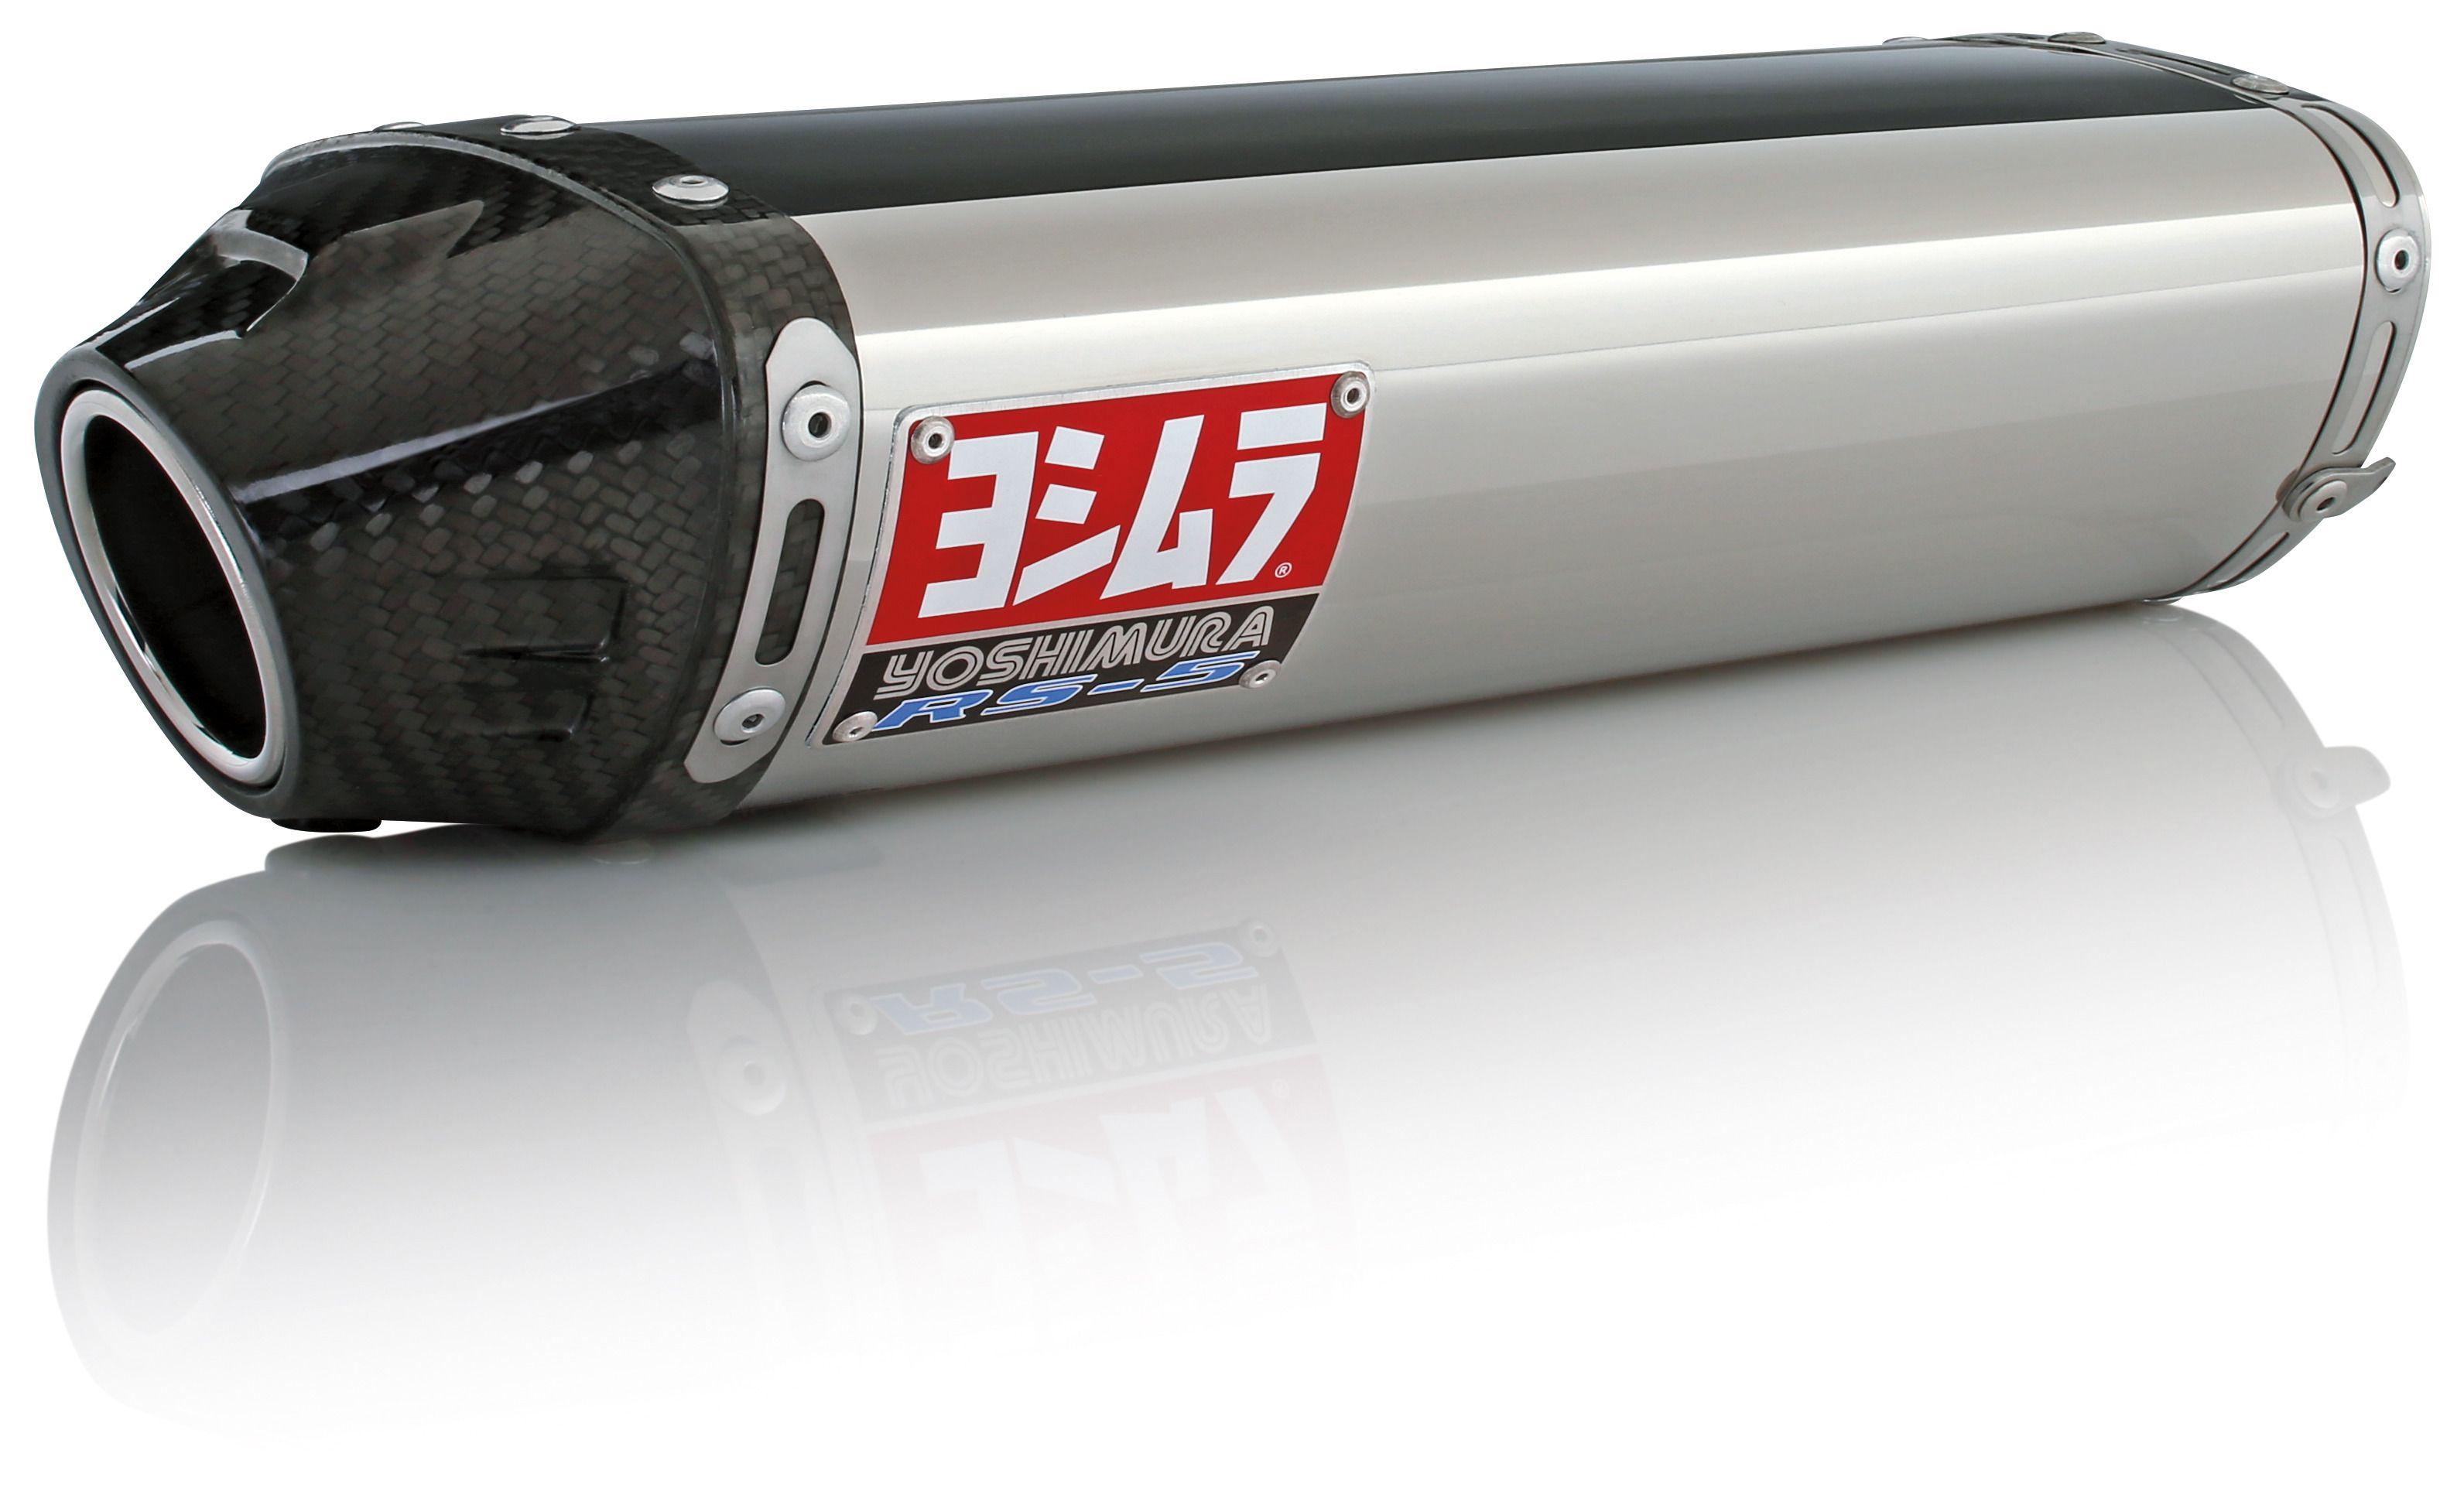 Yoshimura Rs5 Race Exhaust System Honda Cbr600rr 2009 2019 5 49 95 Off